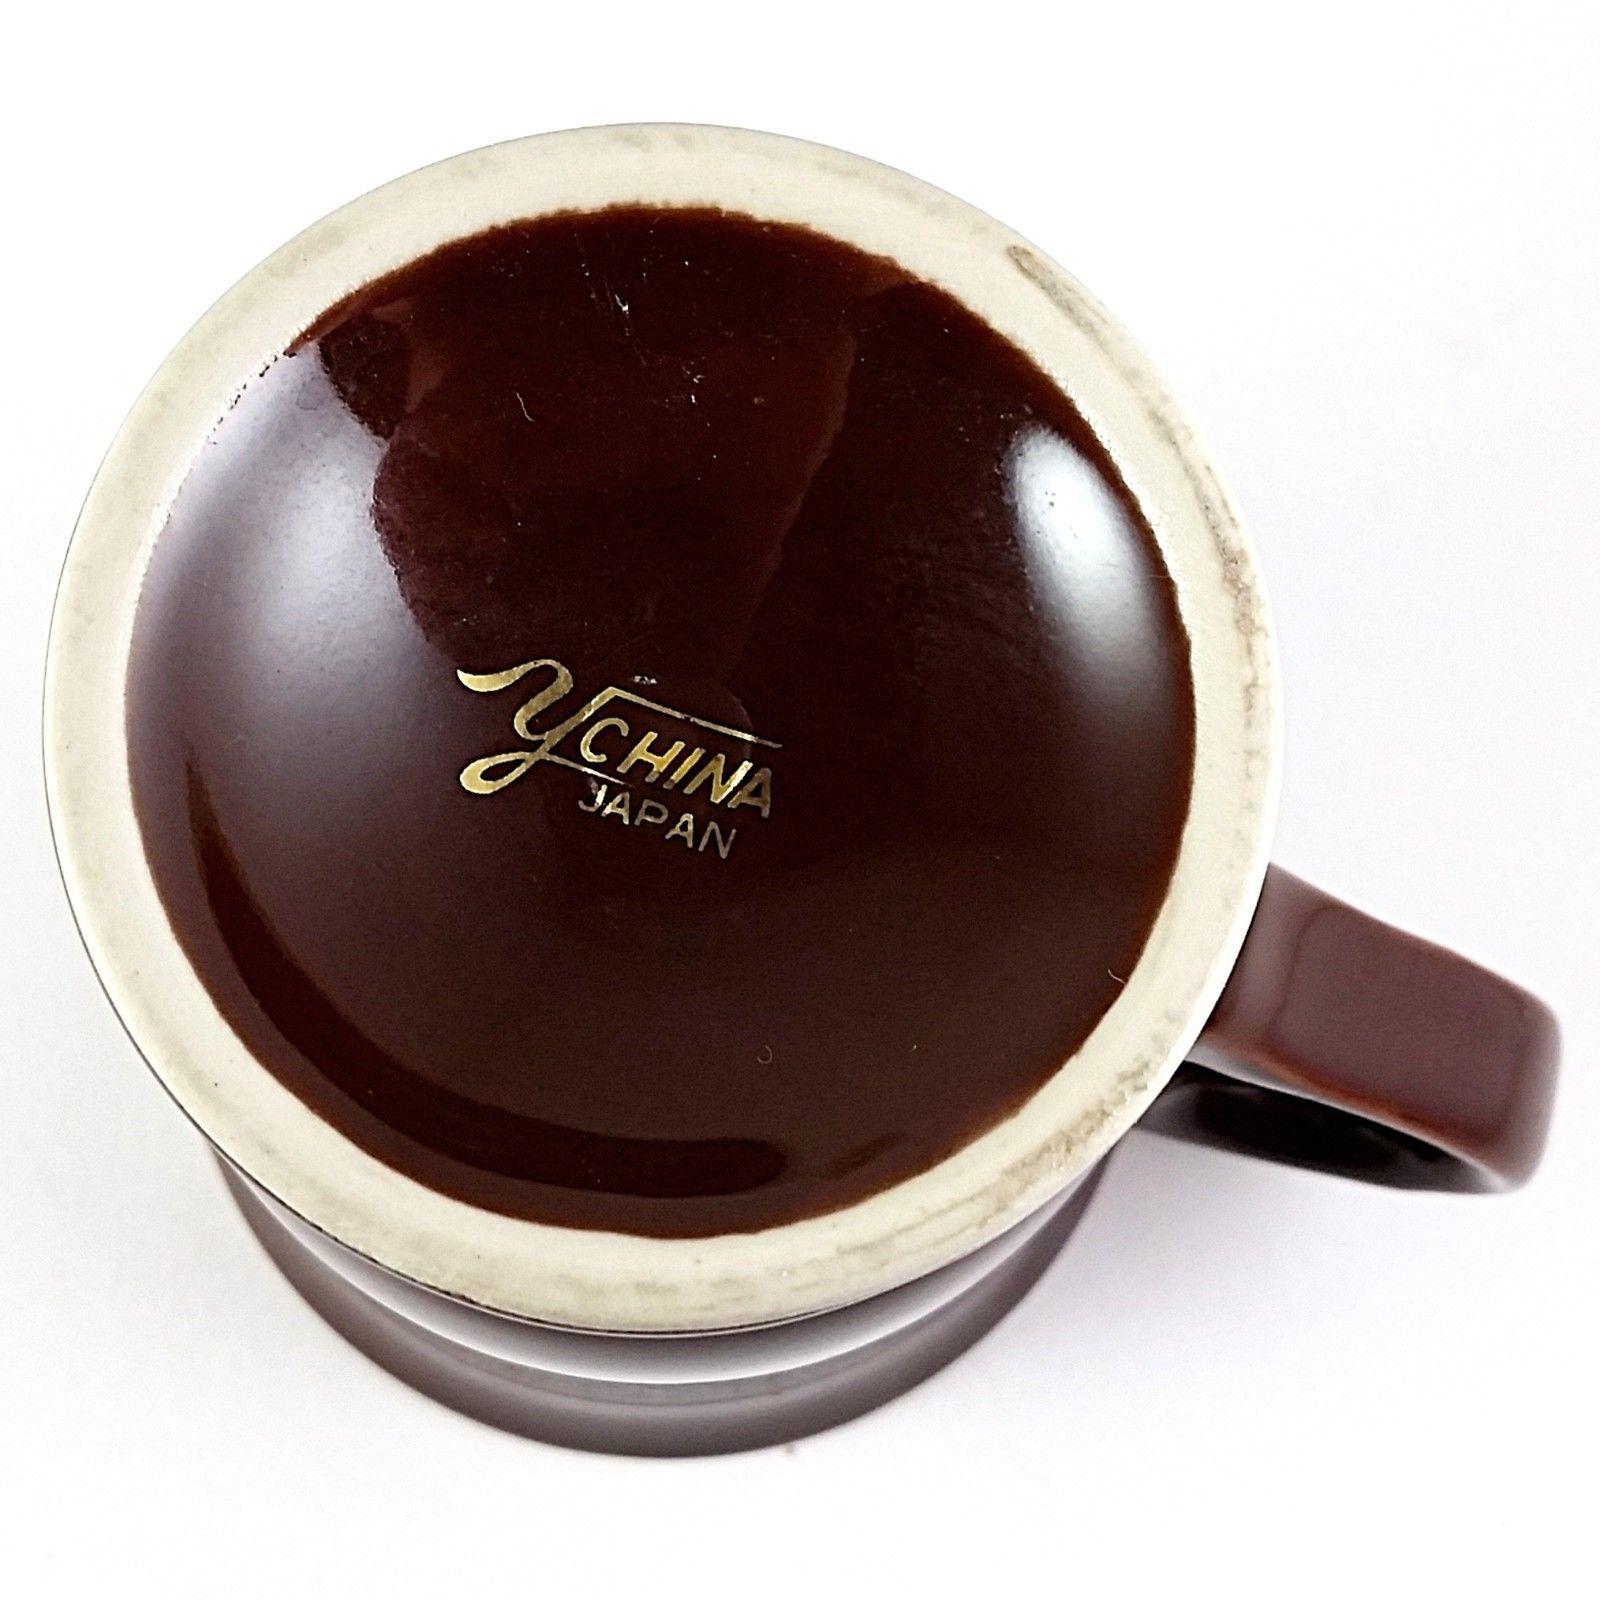 Peacock Pedestal Coffee Mug Cup Brown Vintage Ychina Japan 10oz Gold Trim k758